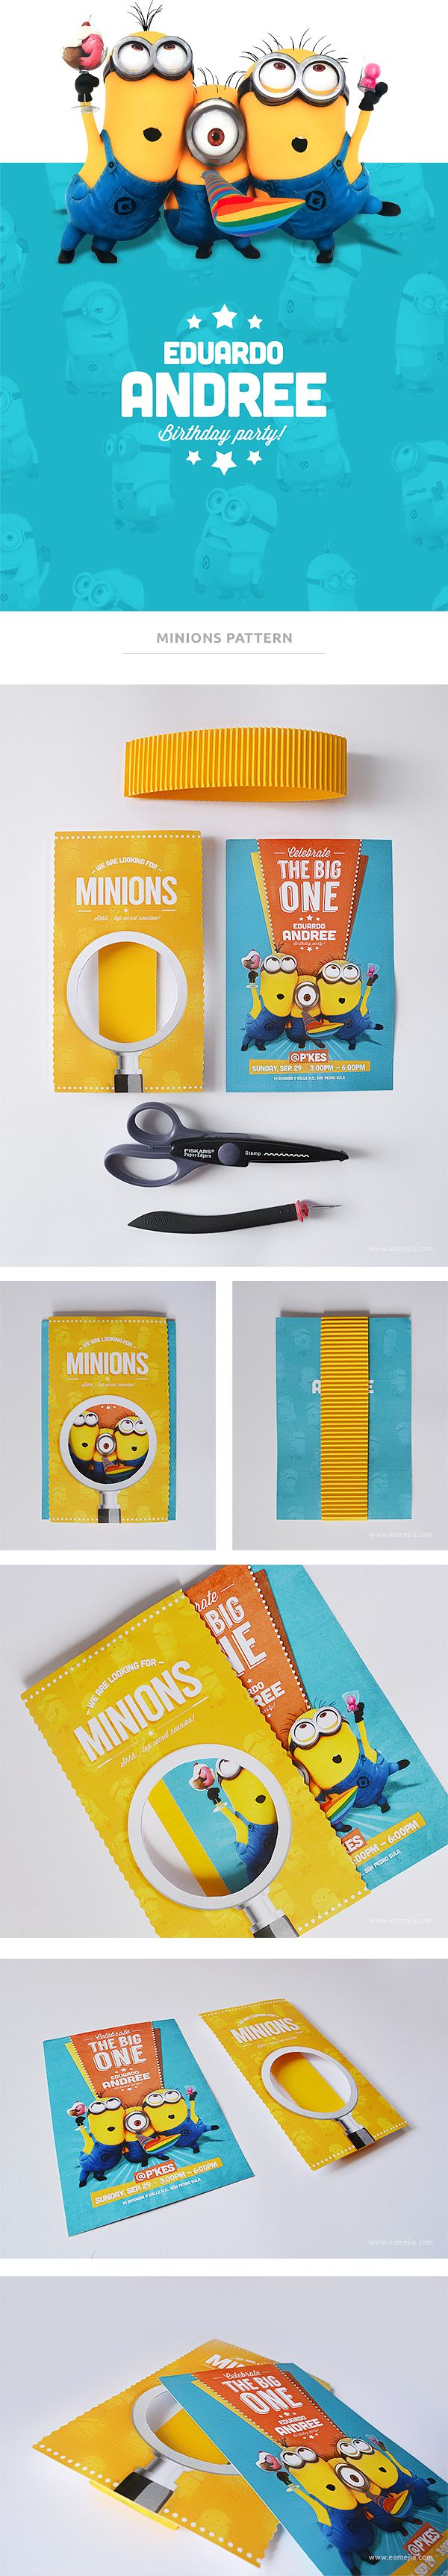 Despicable Me / Minion Birthday Invite by Eduardo Mejia, via Behance